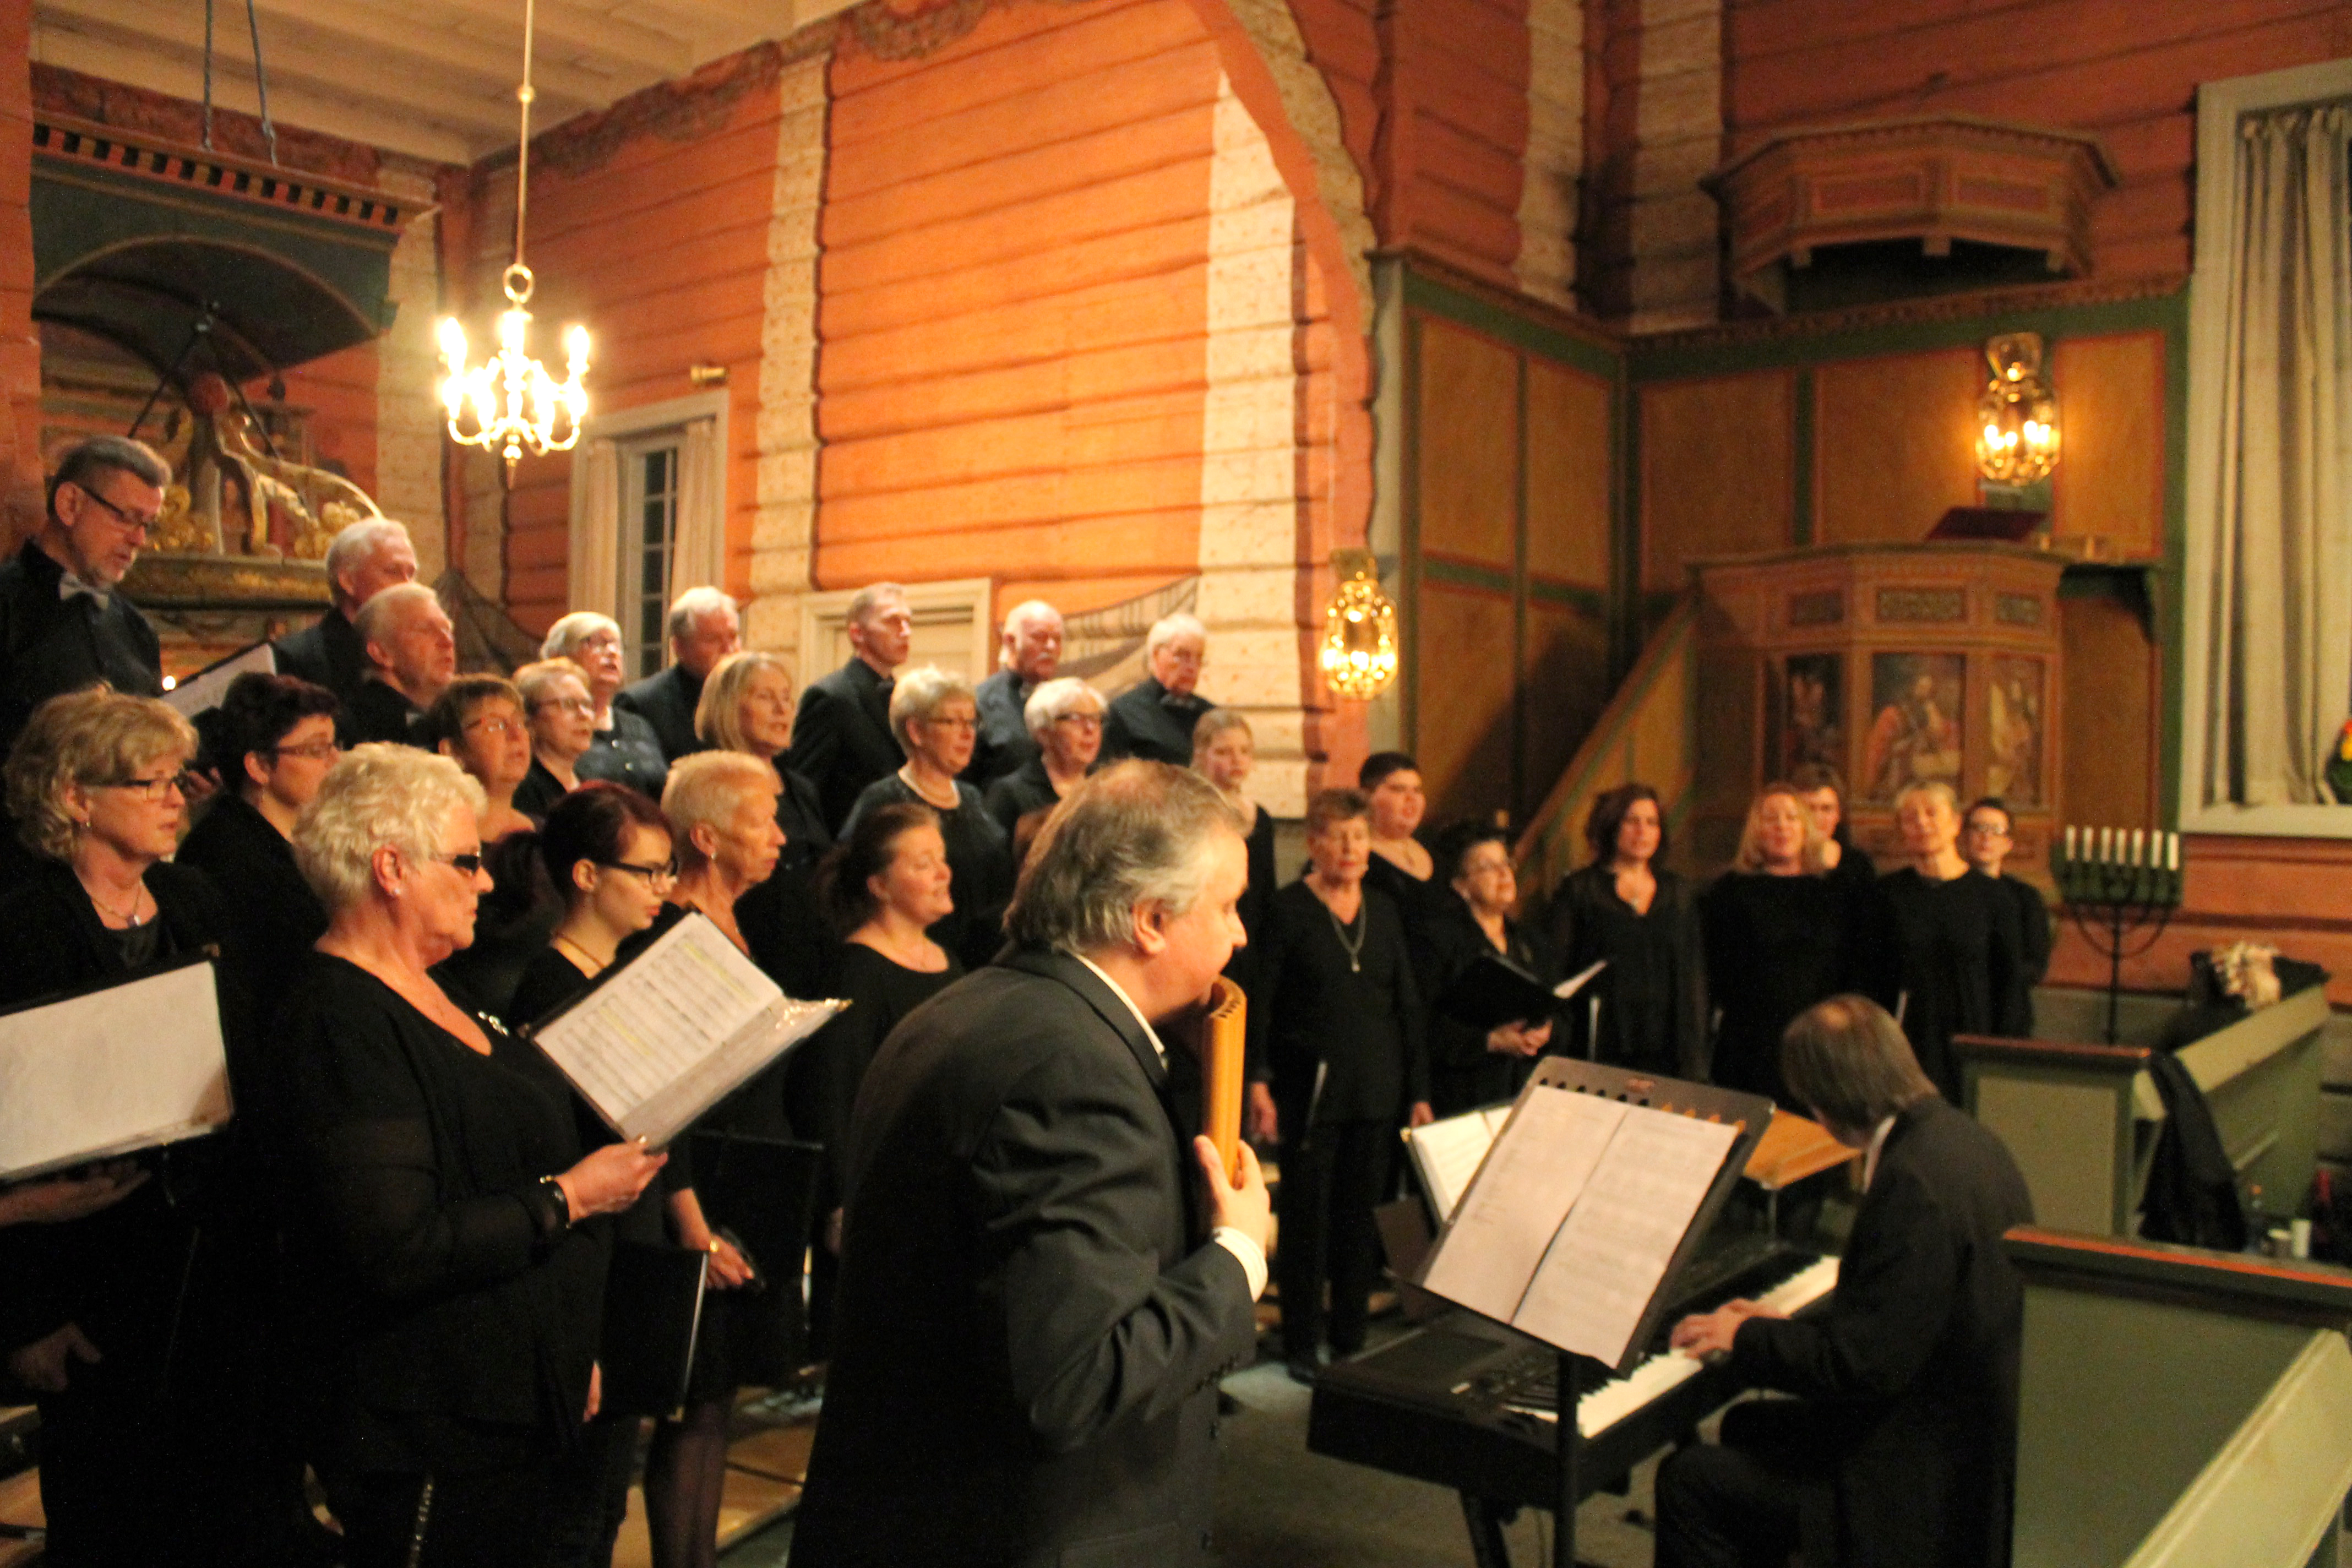 12 Konsert med Roar Engelberg Svarstad kirke 13.03.15 - 9023